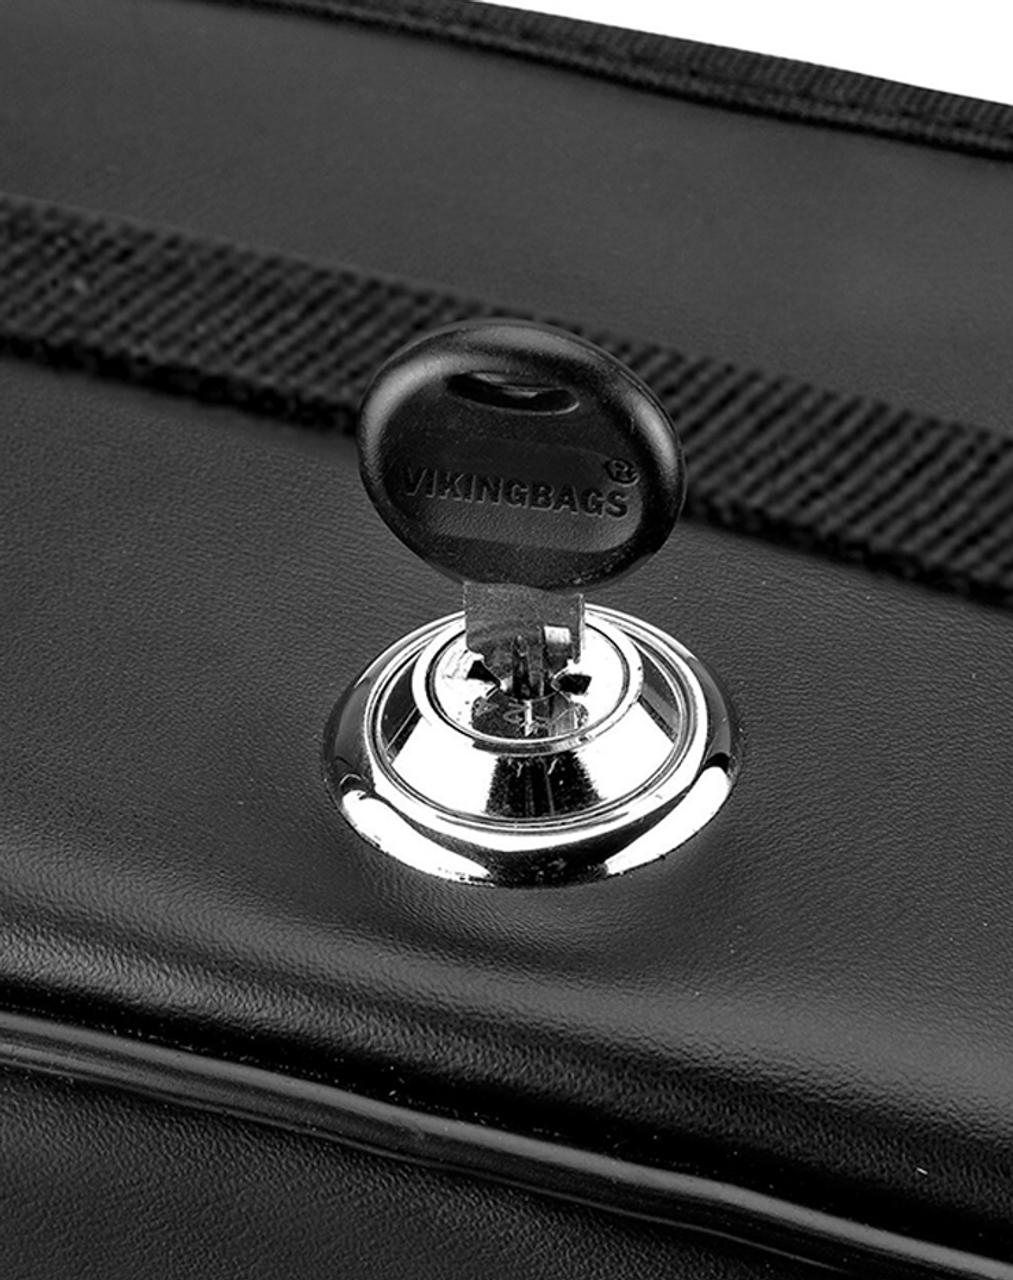 Viking Armor Shock Cutout Large Motorcycle Saddlebags For Harley Dyna Switchback Key Lock View